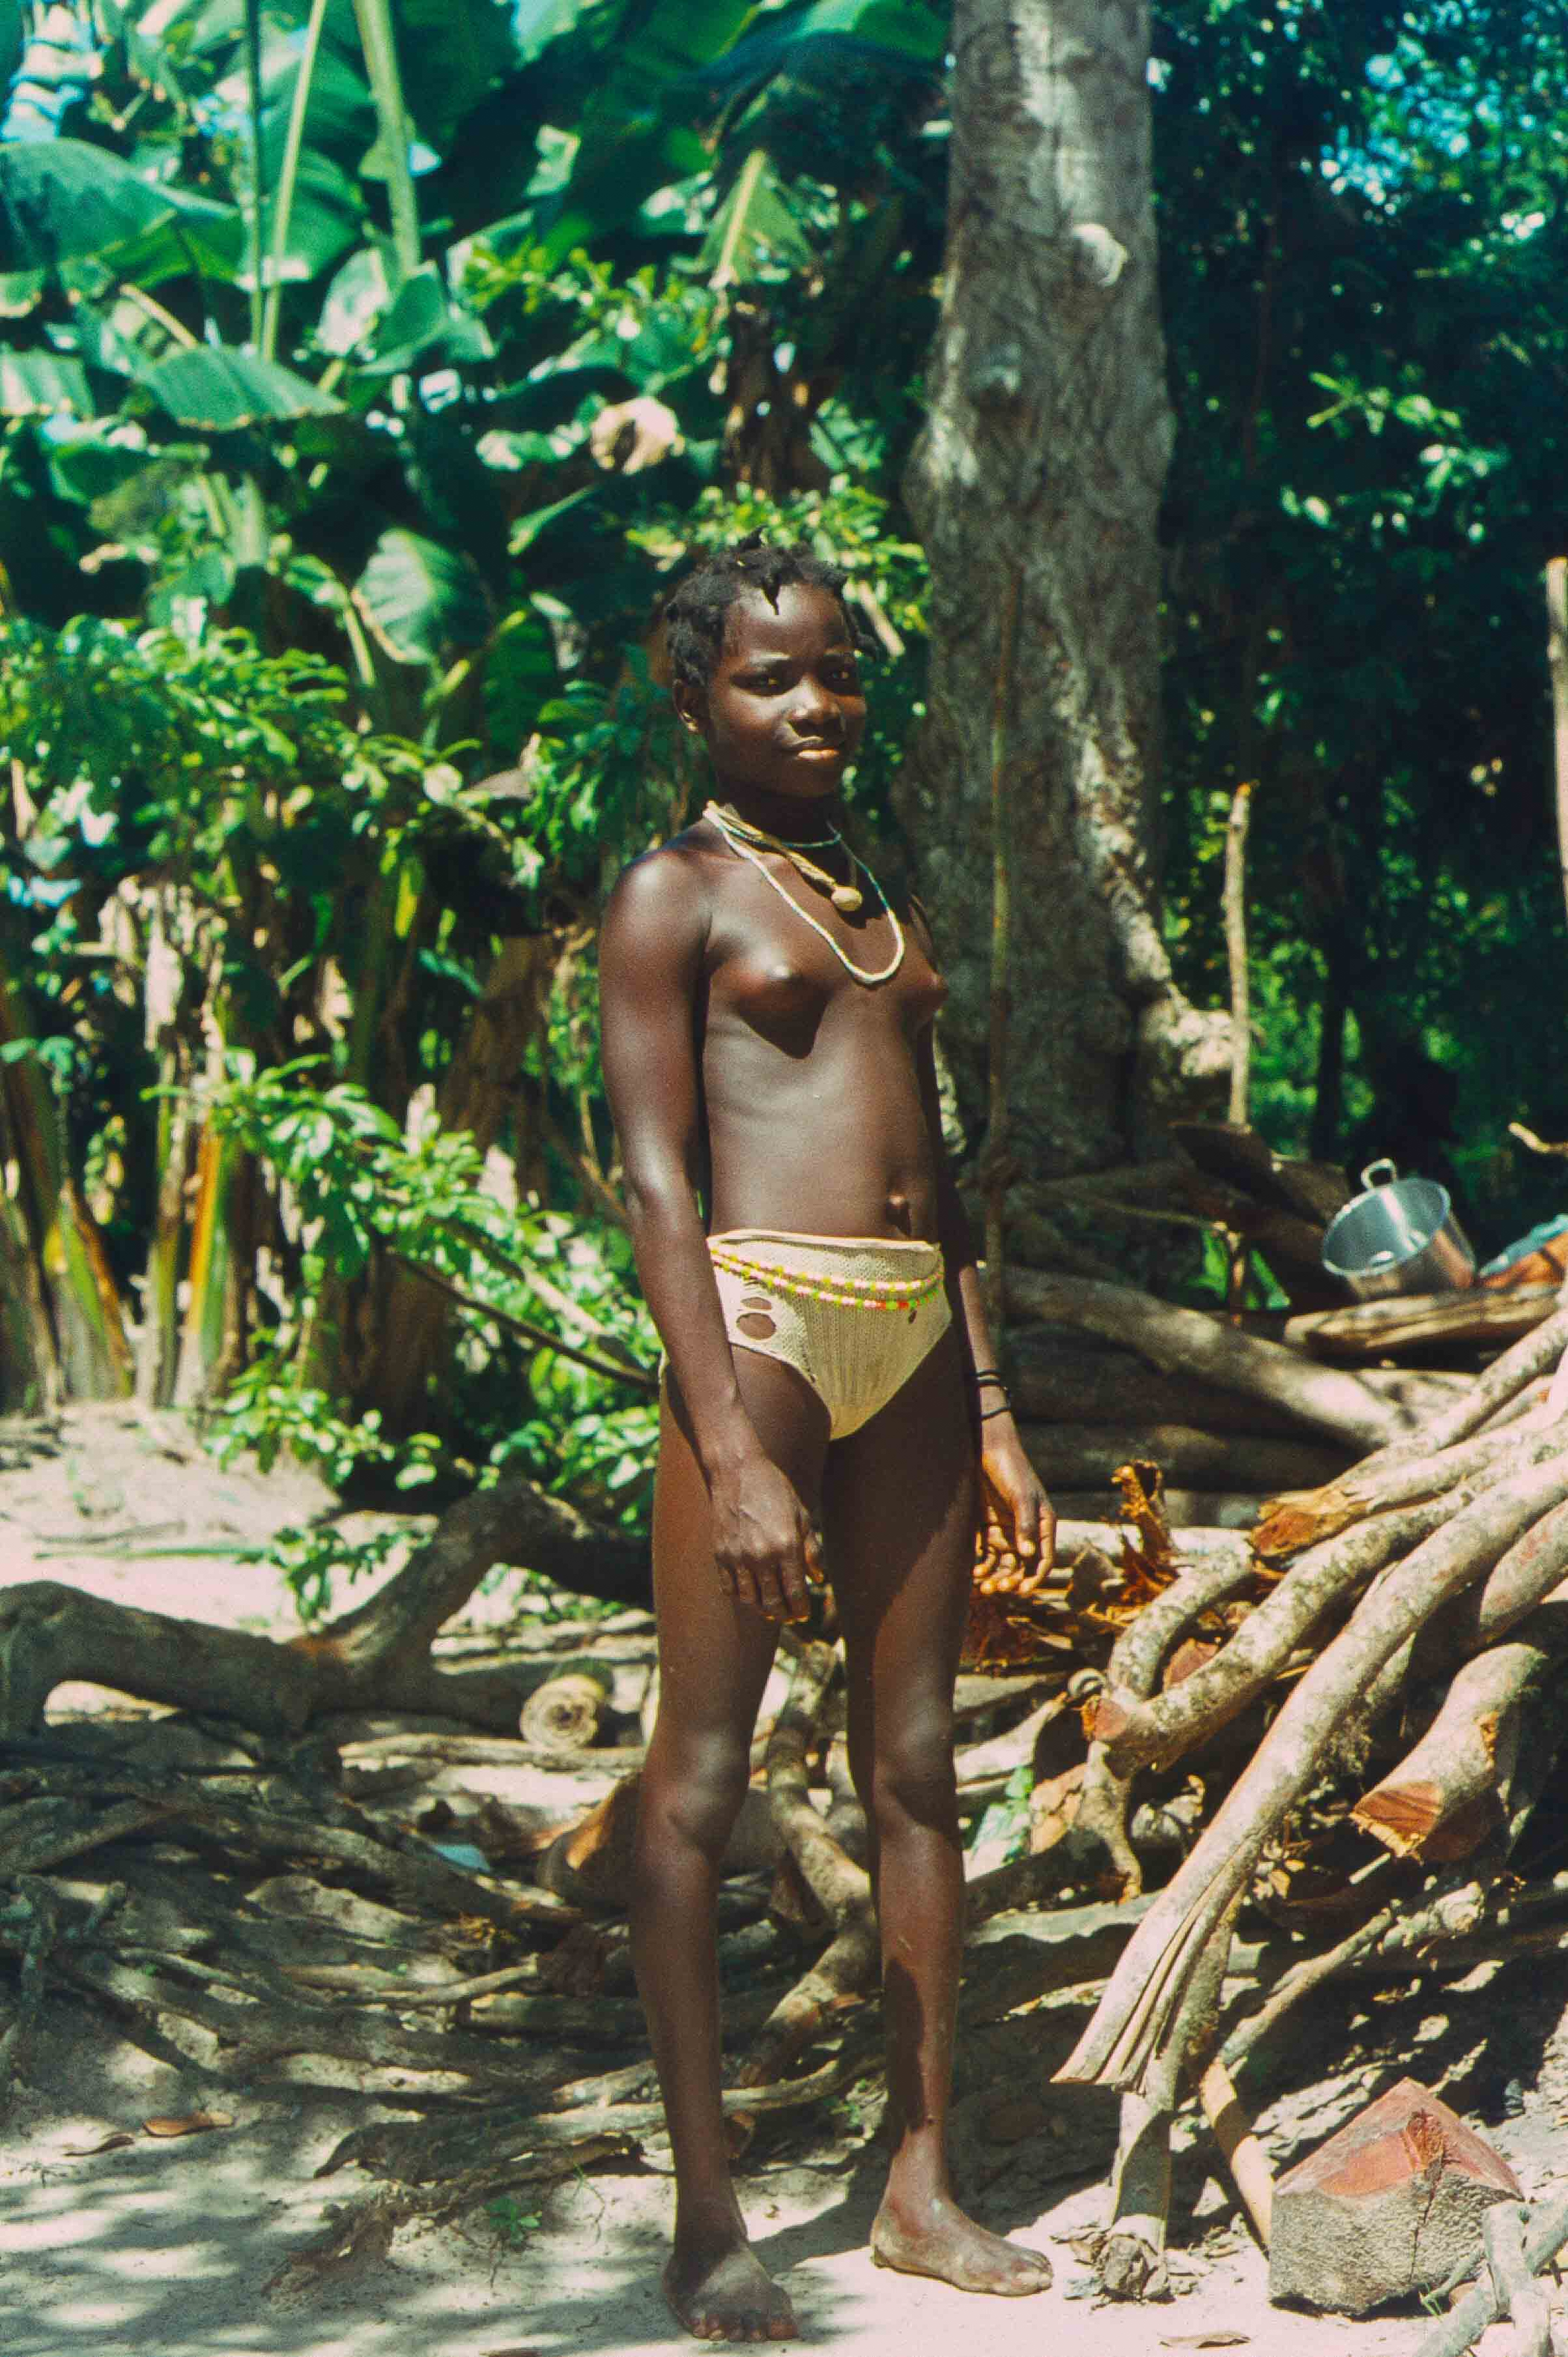 483. Suriname